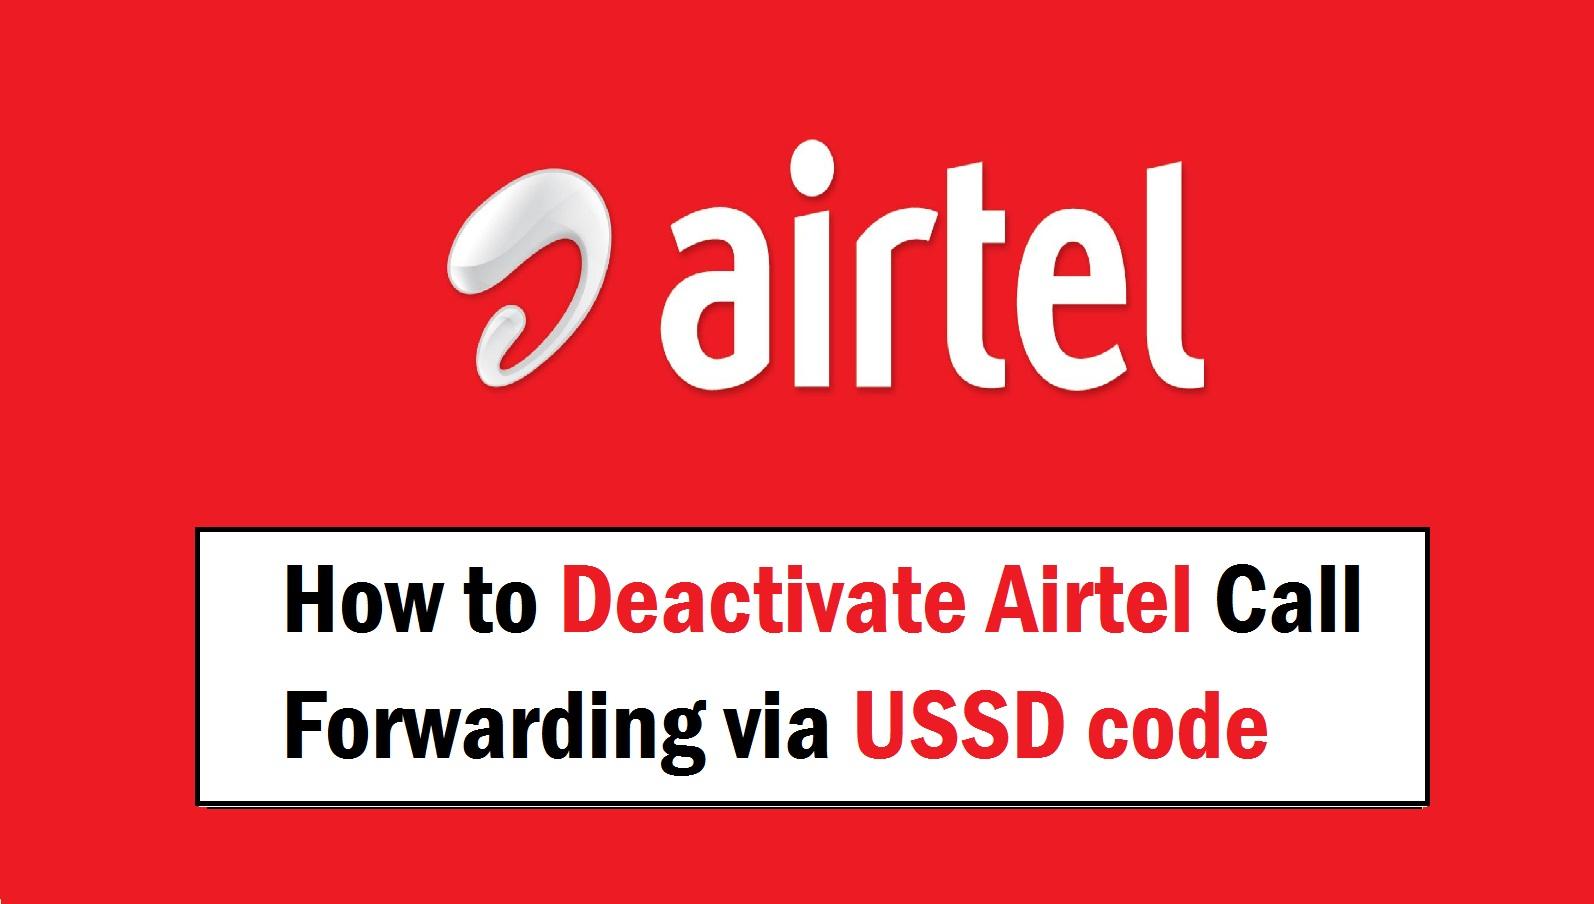 How to Deactivate Airtel Call Forwarding